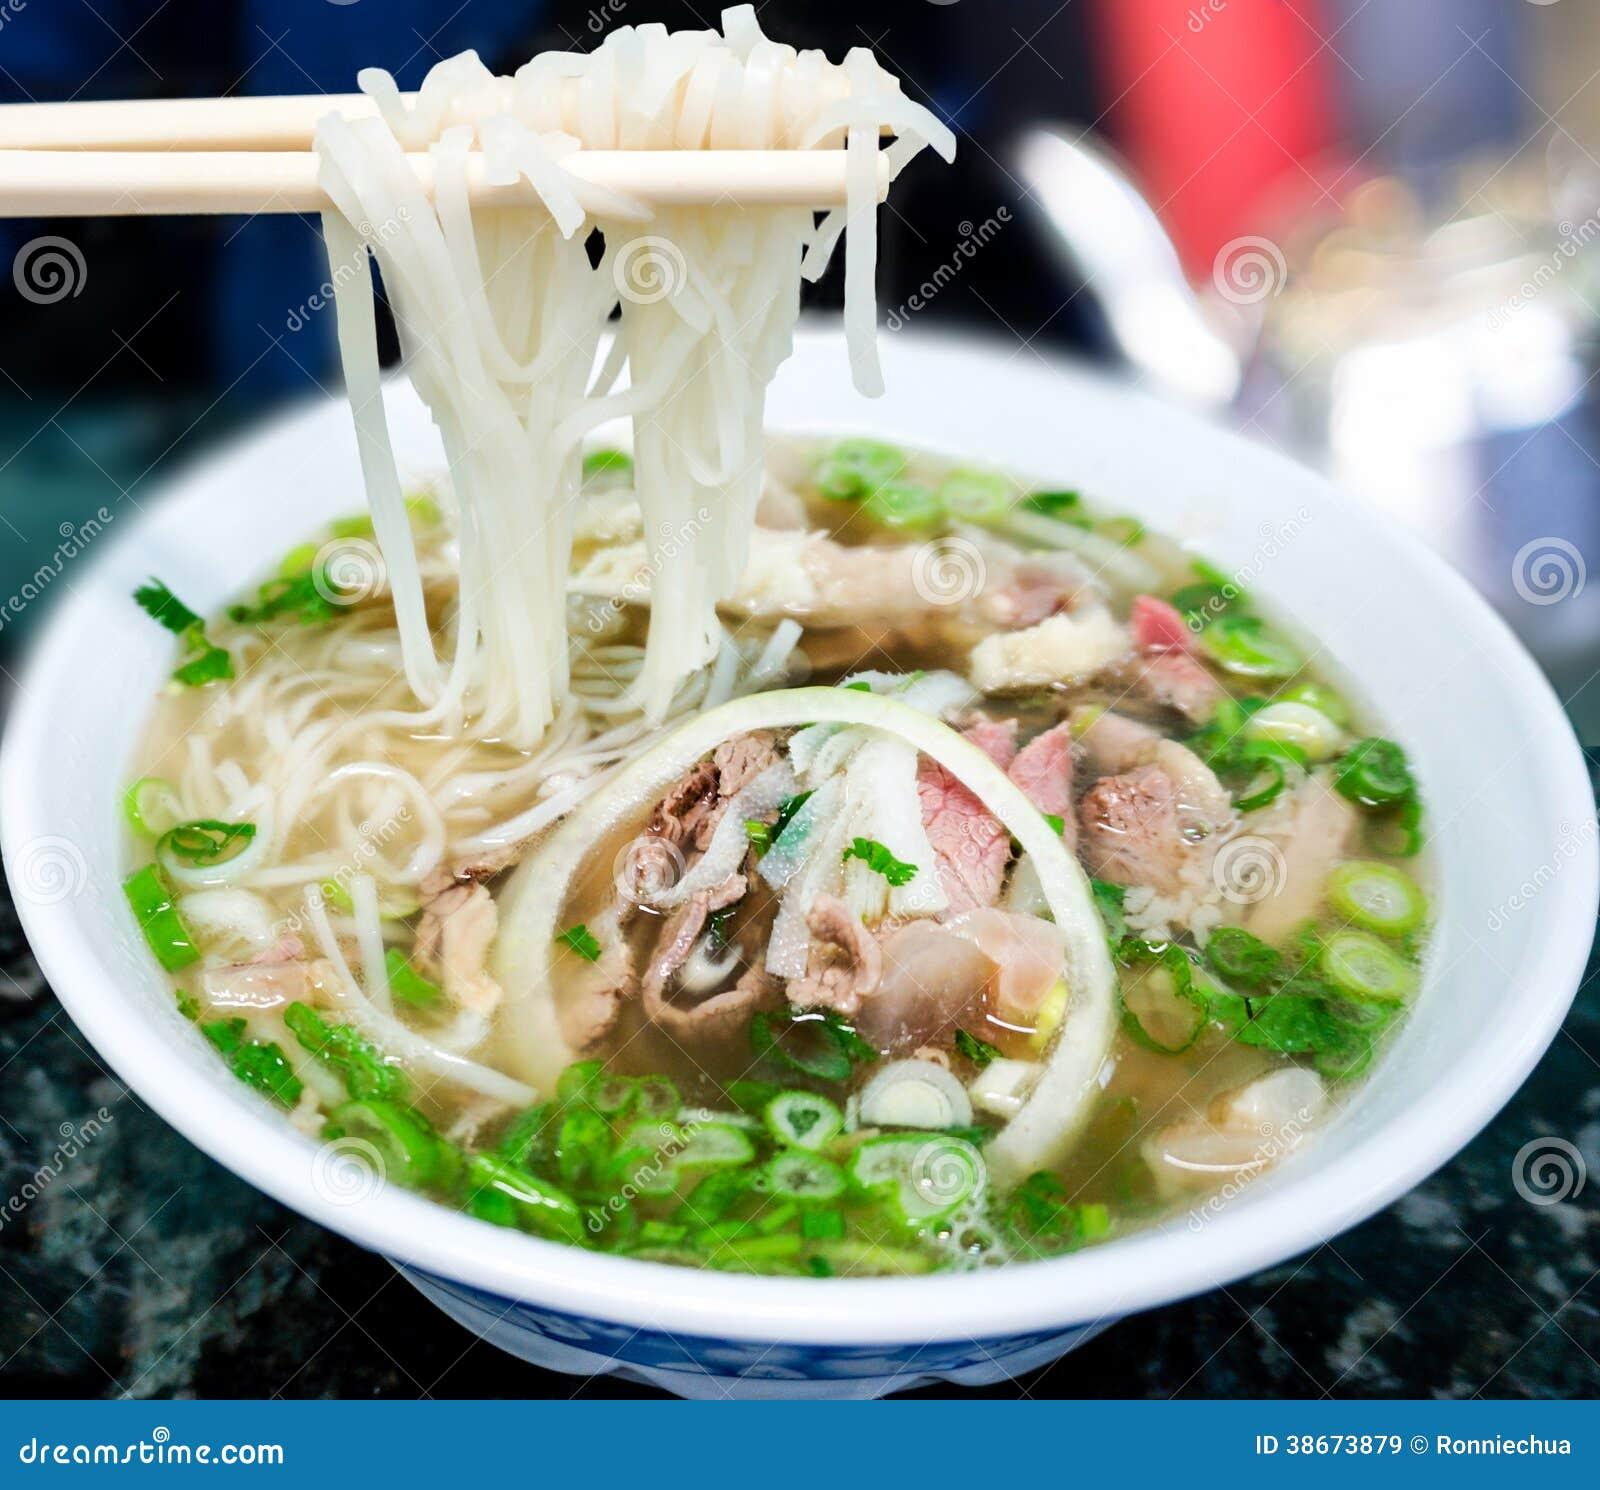 traditionelle vietnamese pho rindfleisch nudelsuppe lizenzfreie stockbilder bild 38673879. Black Bedroom Furniture Sets. Home Design Ideas